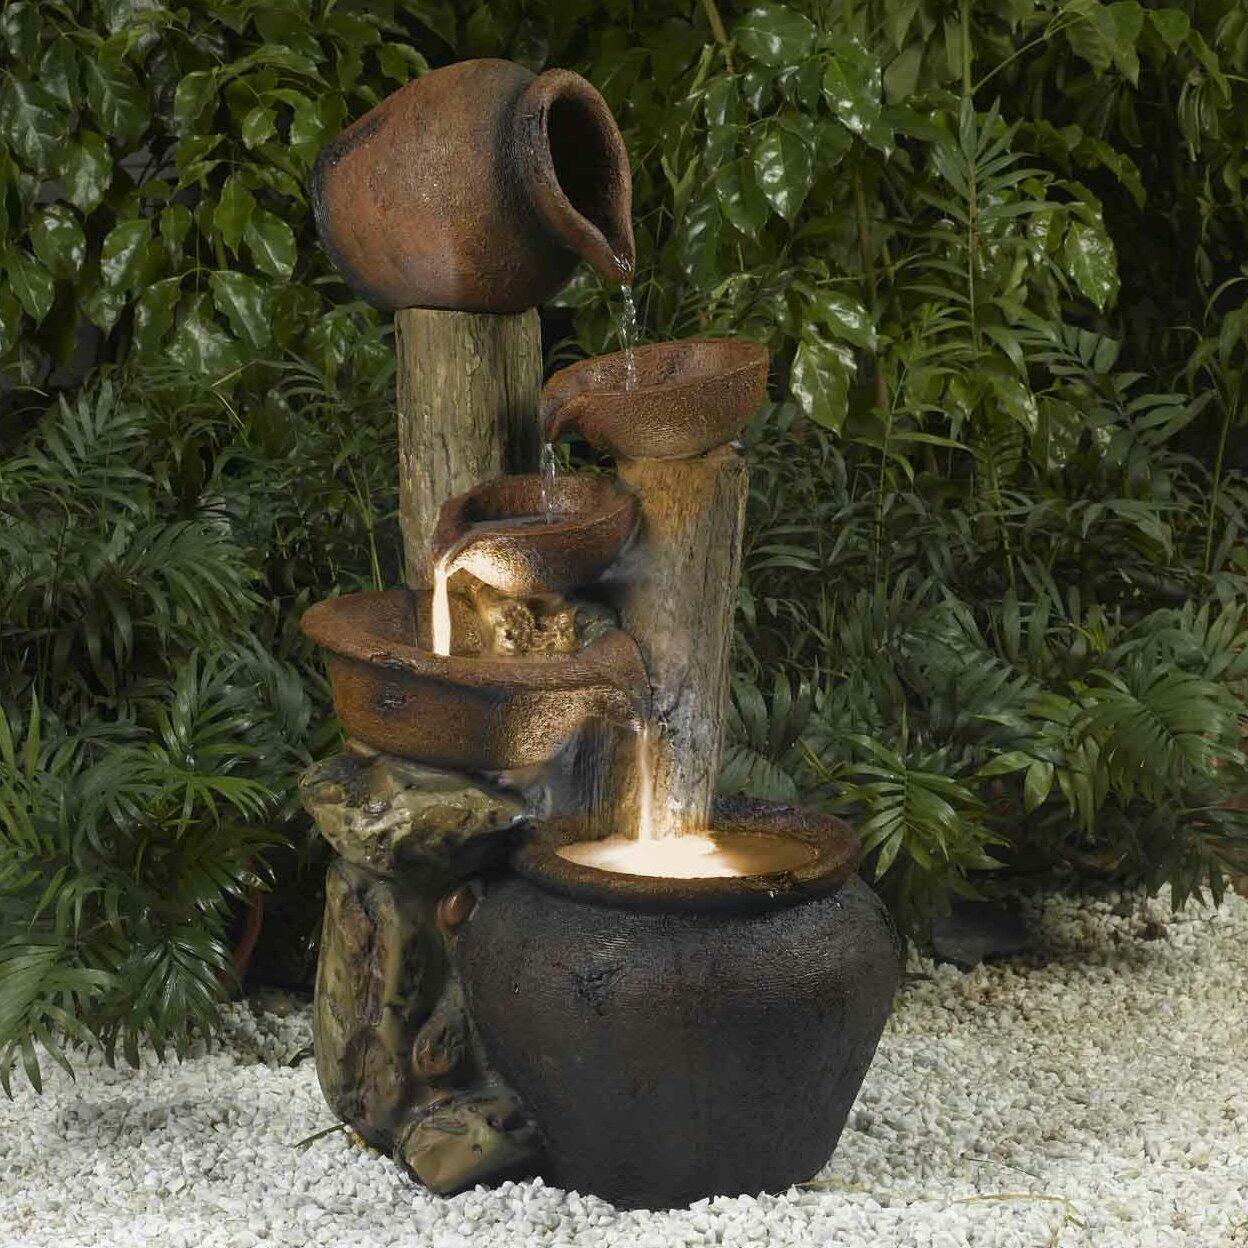 Resin/Fiberglass Pentole Pot Indoor/Outdoor Fountain With Light